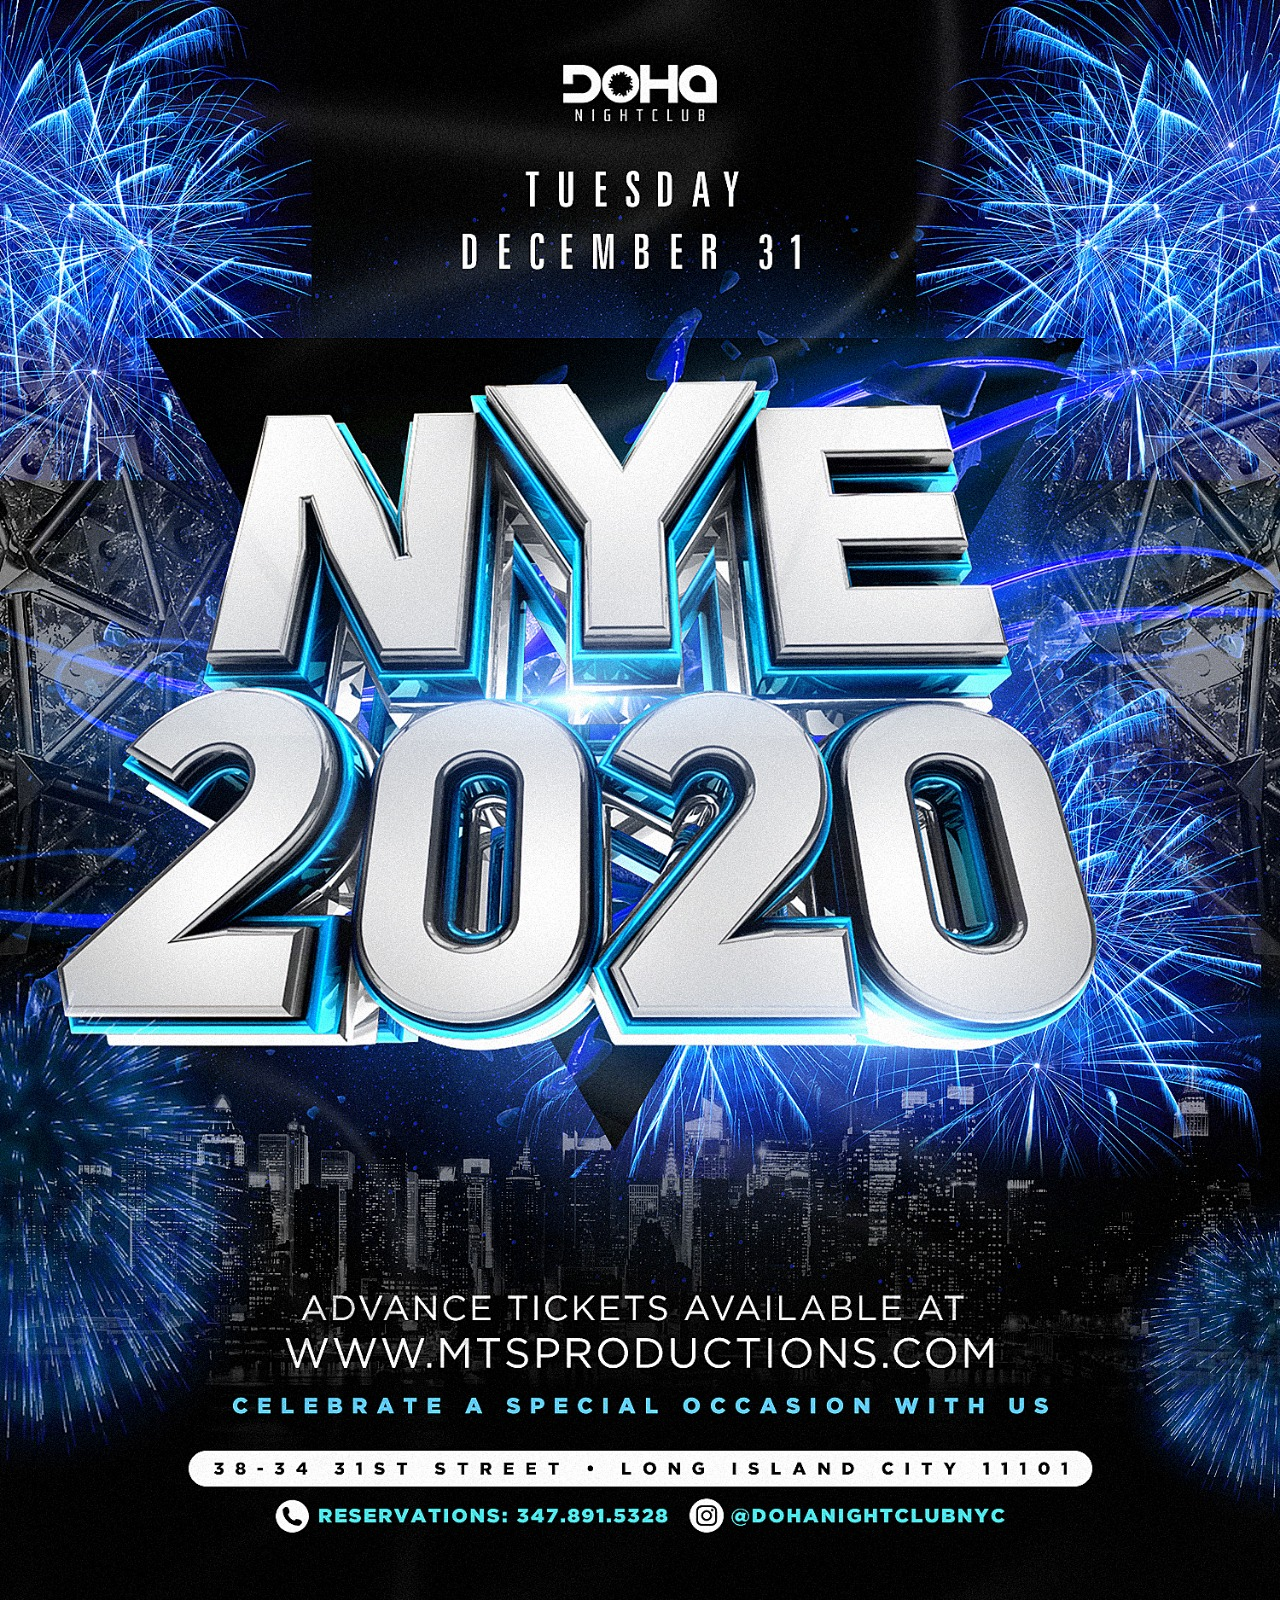 Doha Nightclub new years eve